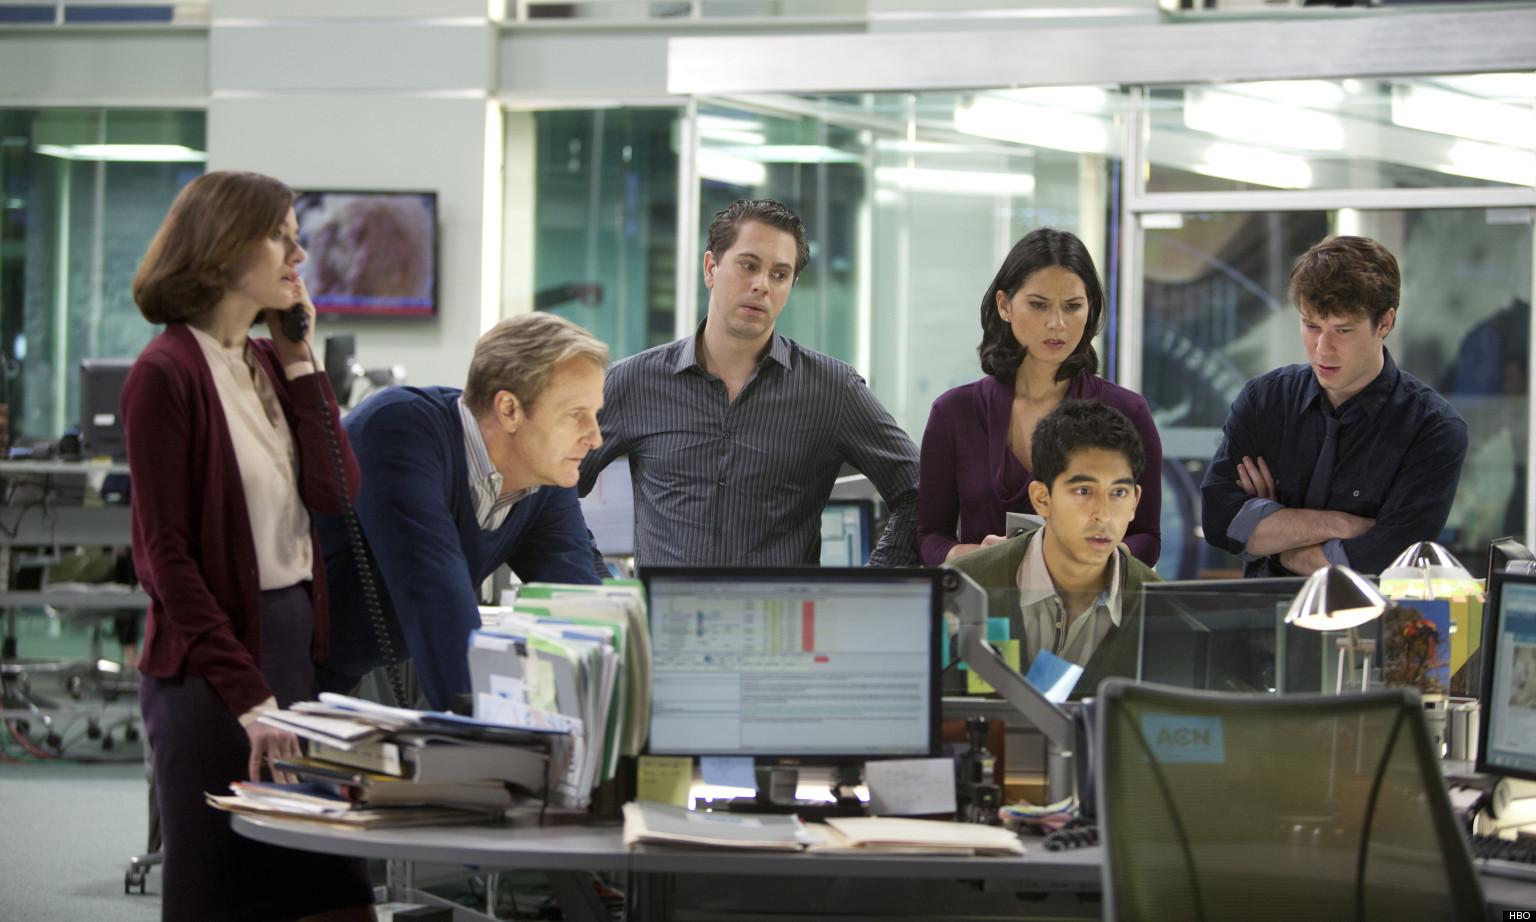 o-the-newsroom-premiere-date-facebook.jpg